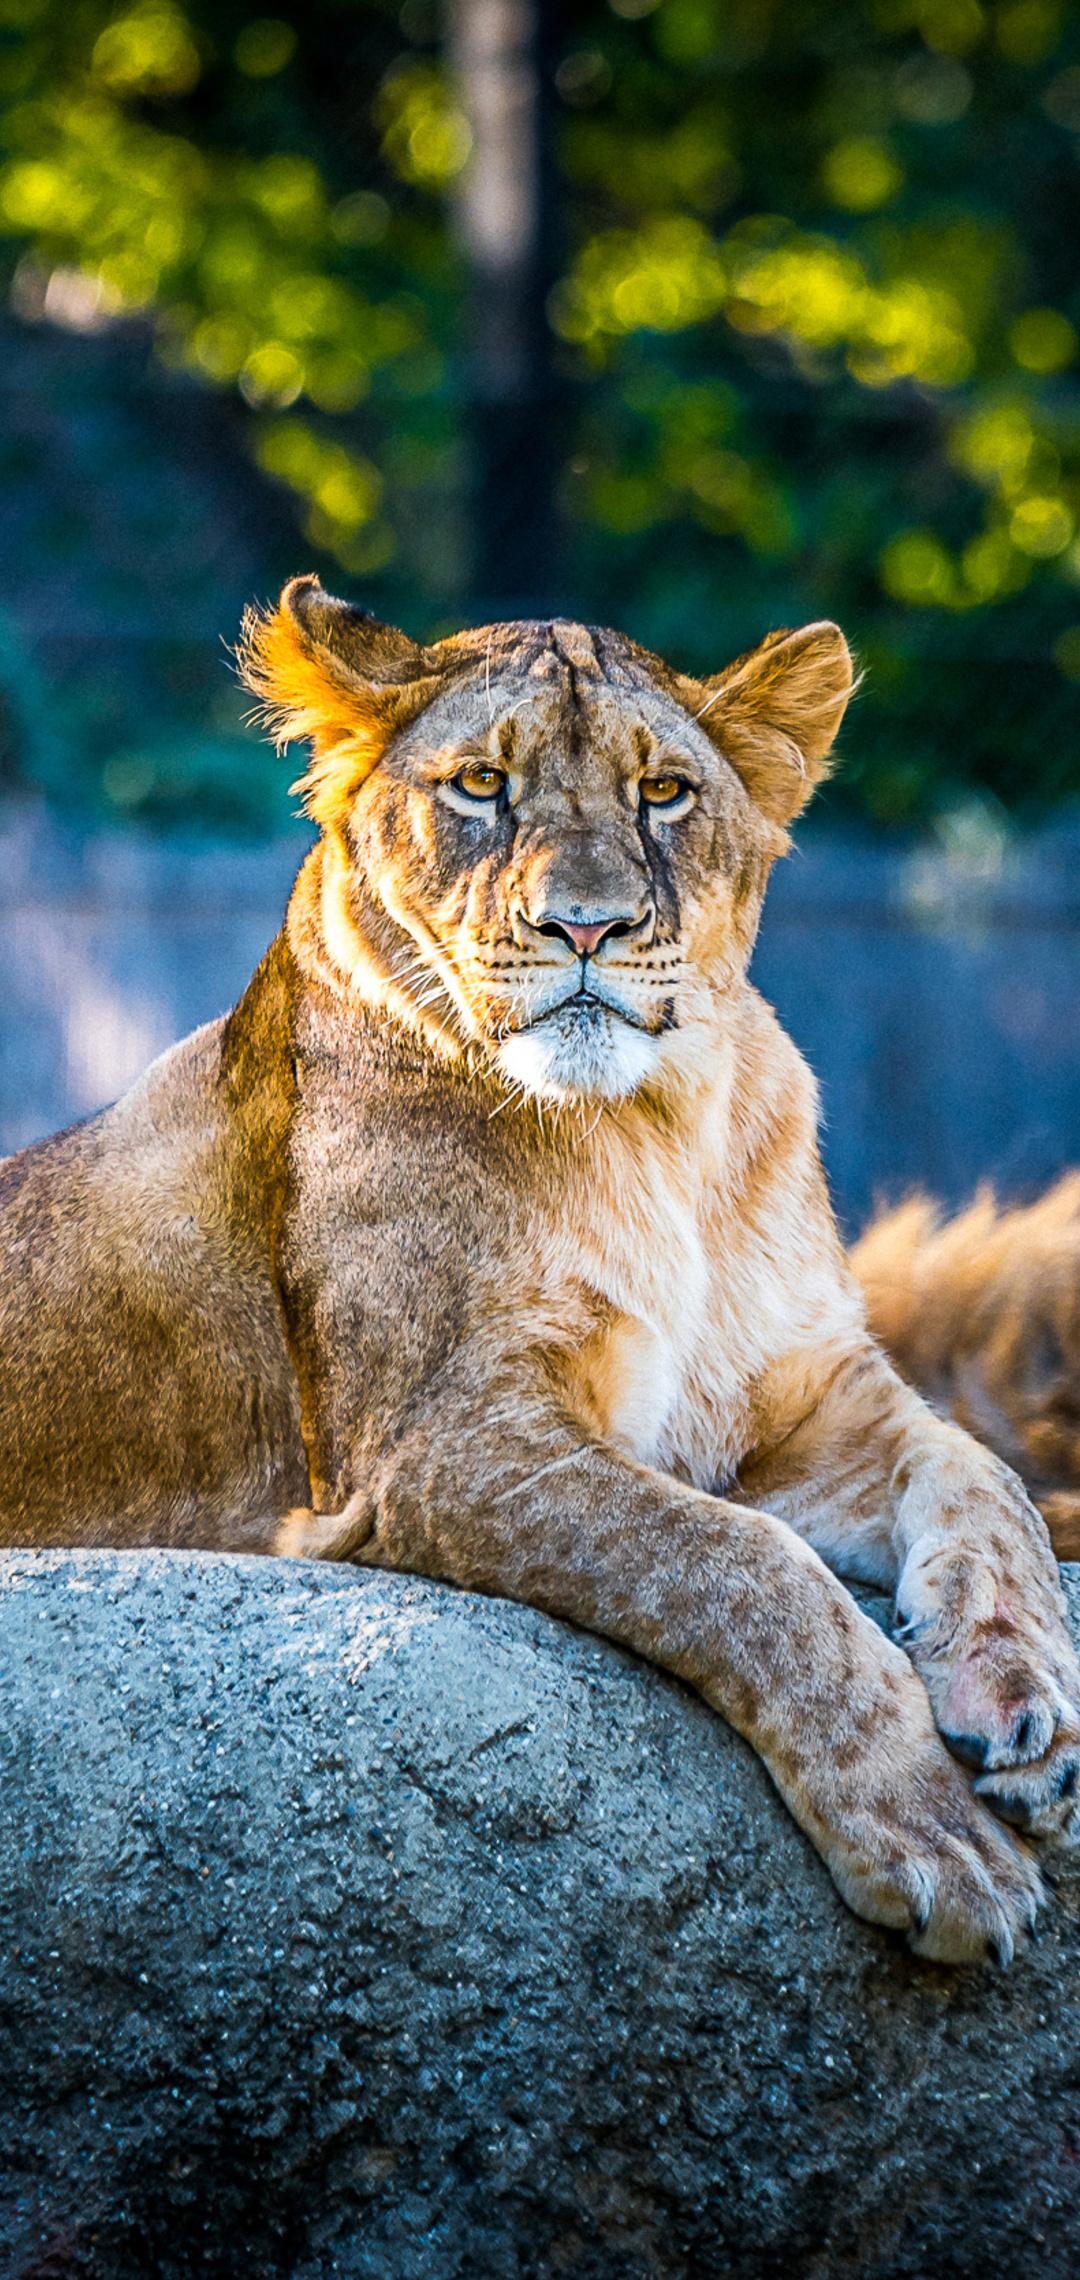 lionesse-lion-predator-wild-animal-4k-ba.jpg